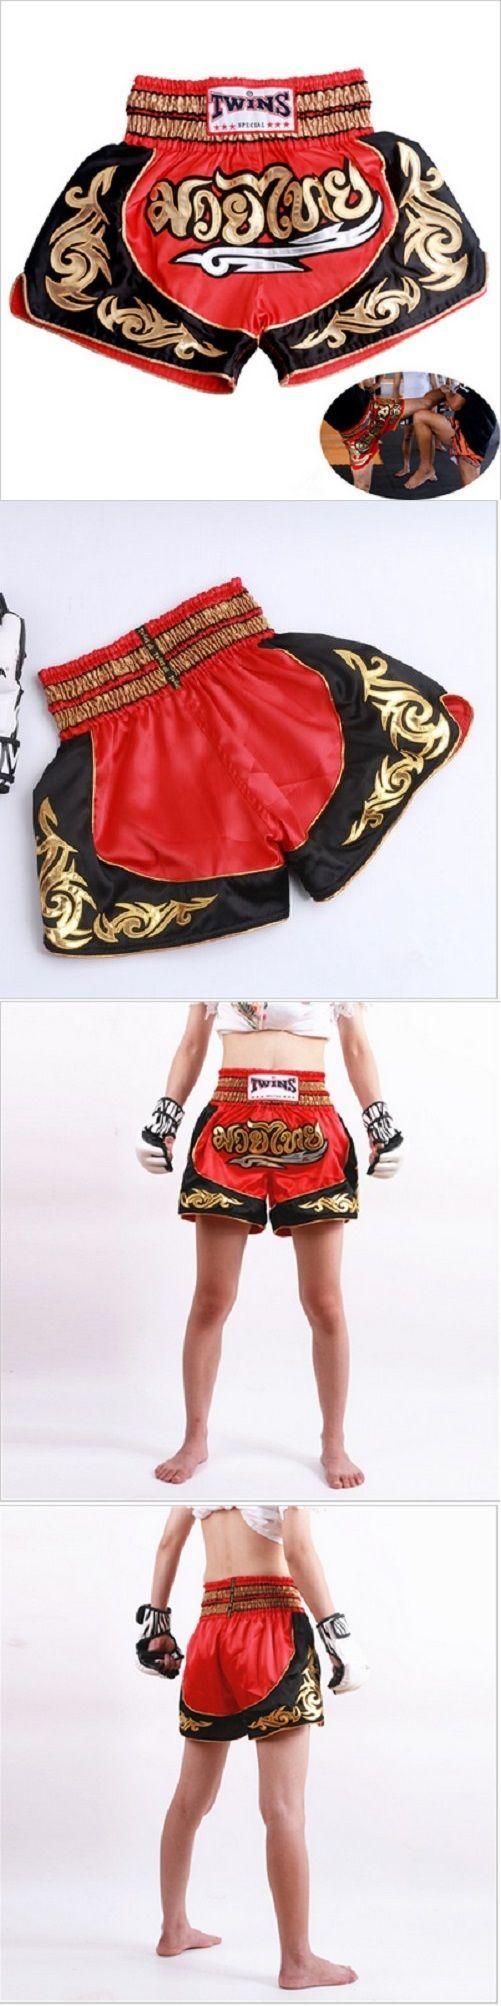 Pants 179772: Mma Shorts Pantalonetas Muay Thai Kick Boxing Fight Gym Fitness Shorts Pants Red -> BUY IT NOW ONLY: $38.63 on eBay!